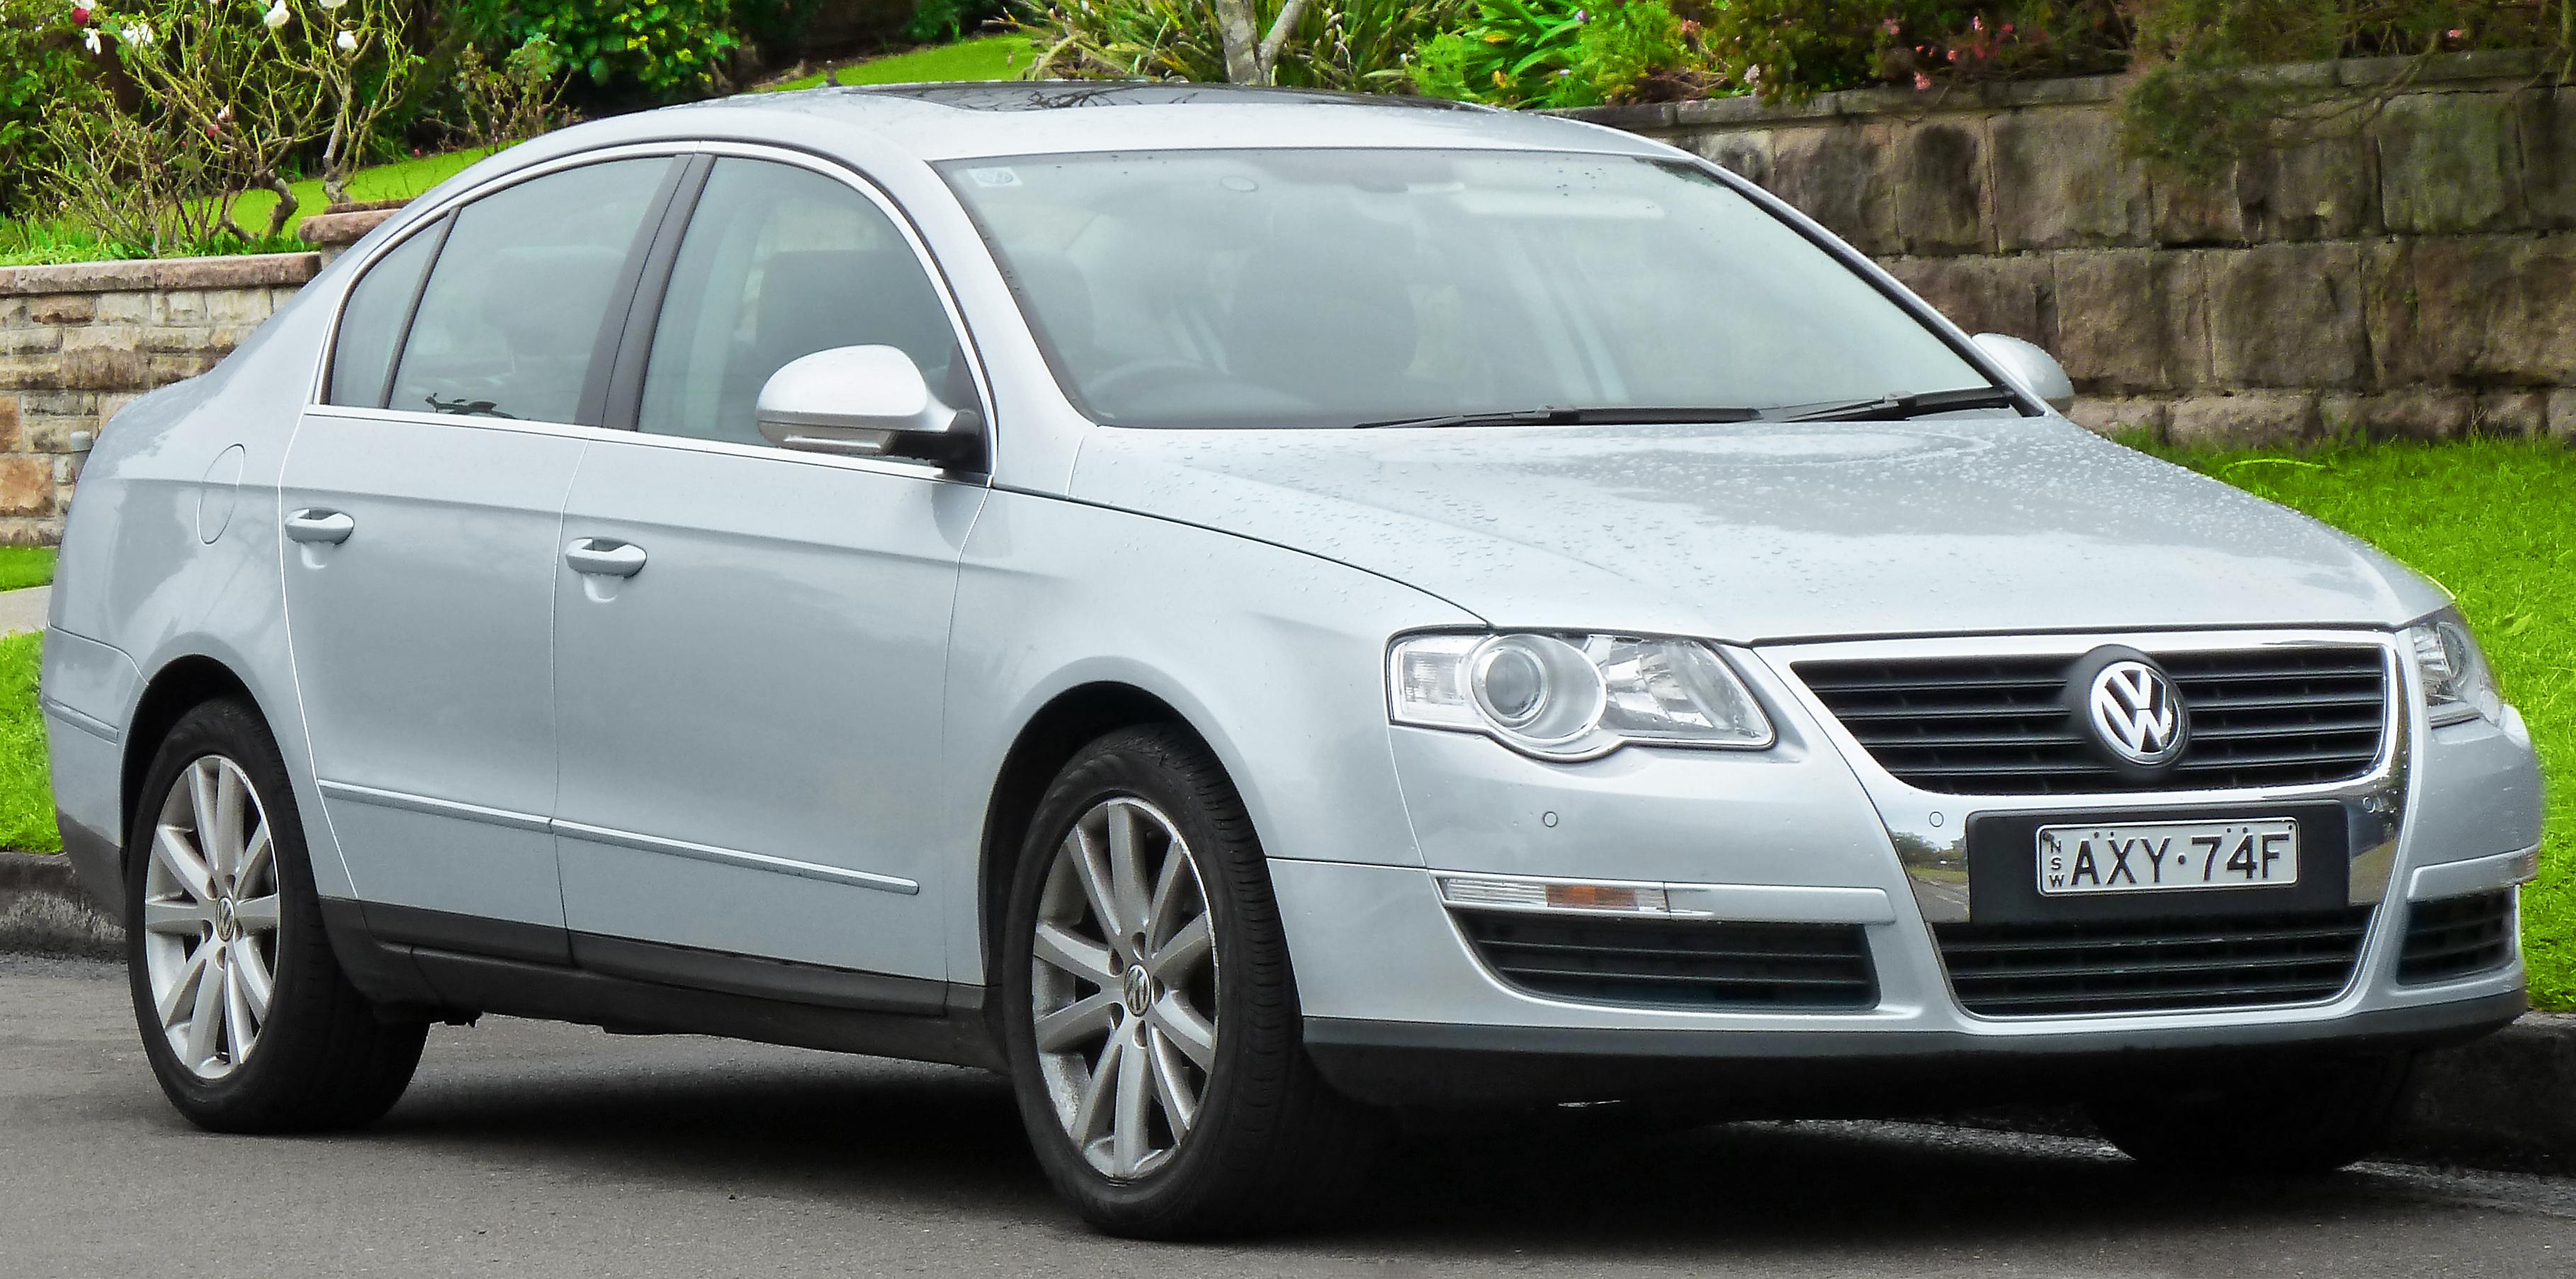 Description 2006-2010 Volkswagen Passat (3C) sedan (2011-07-17) 01.jpg